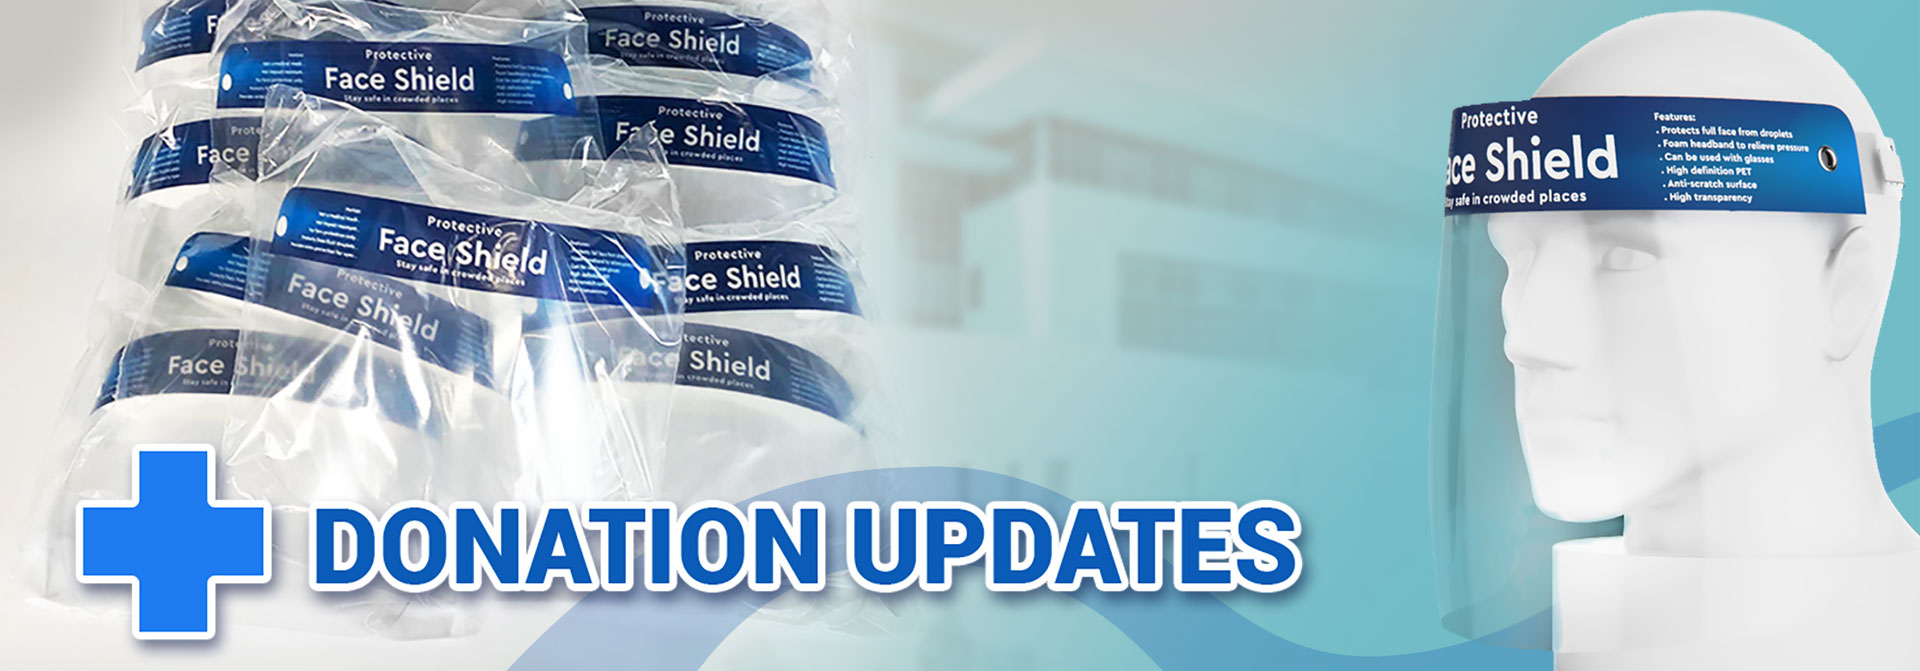 donation updates